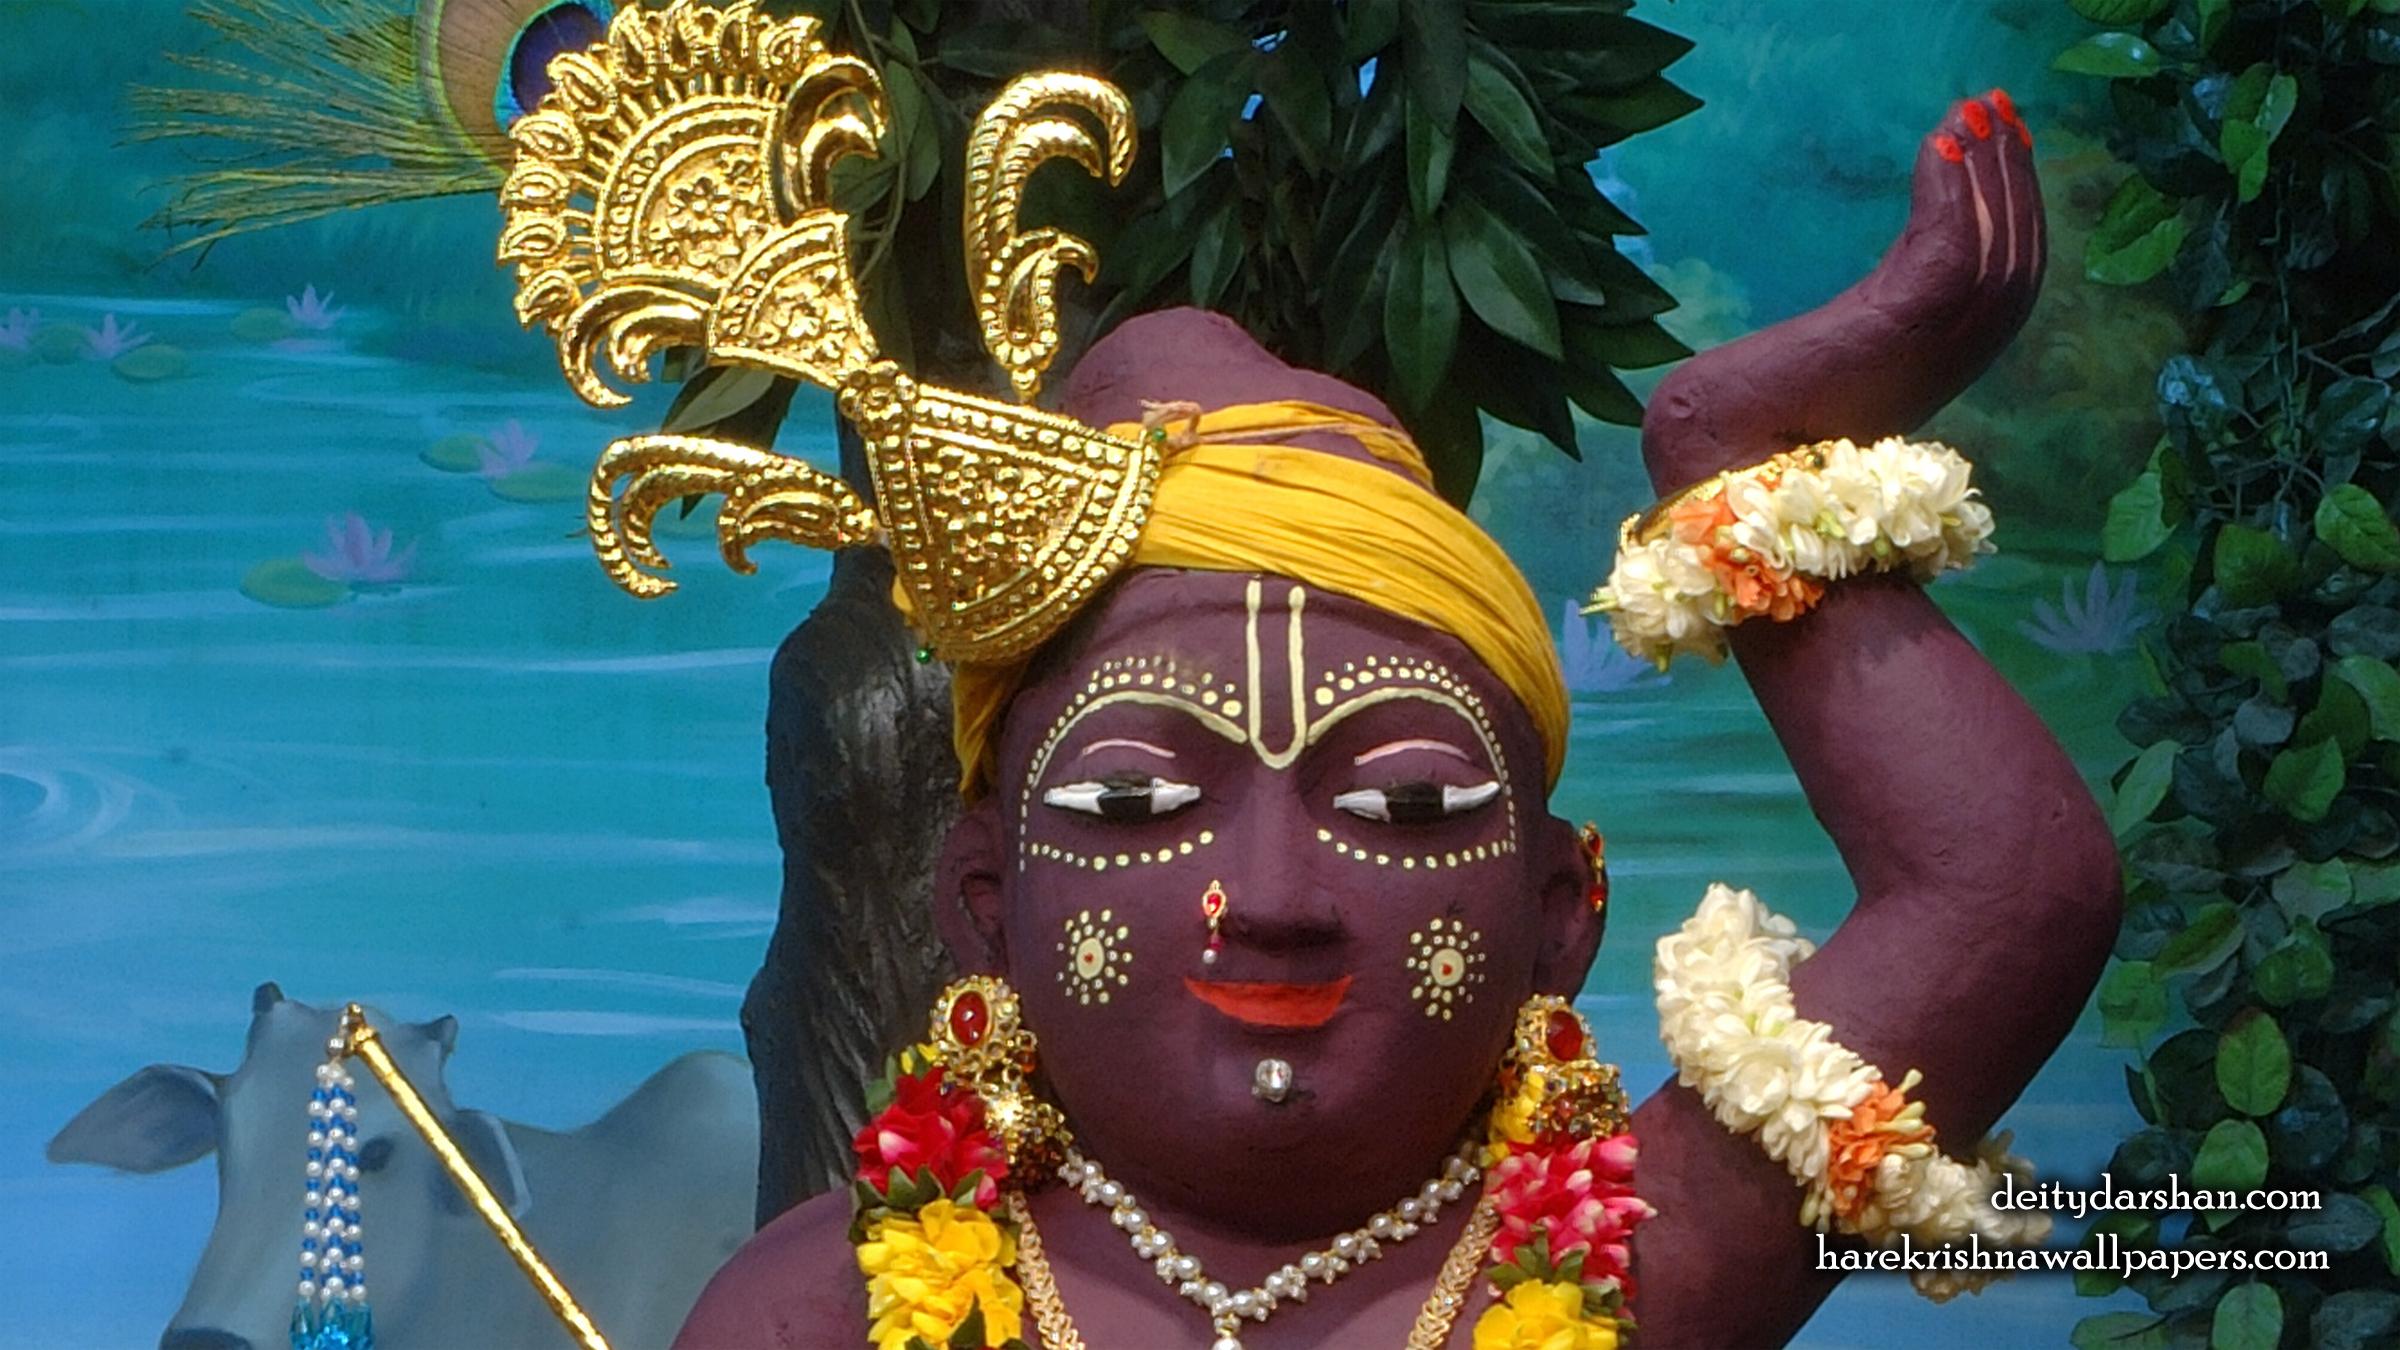 Sri Gopal Close up Wallpaper (031) Size 2400x1350 Download